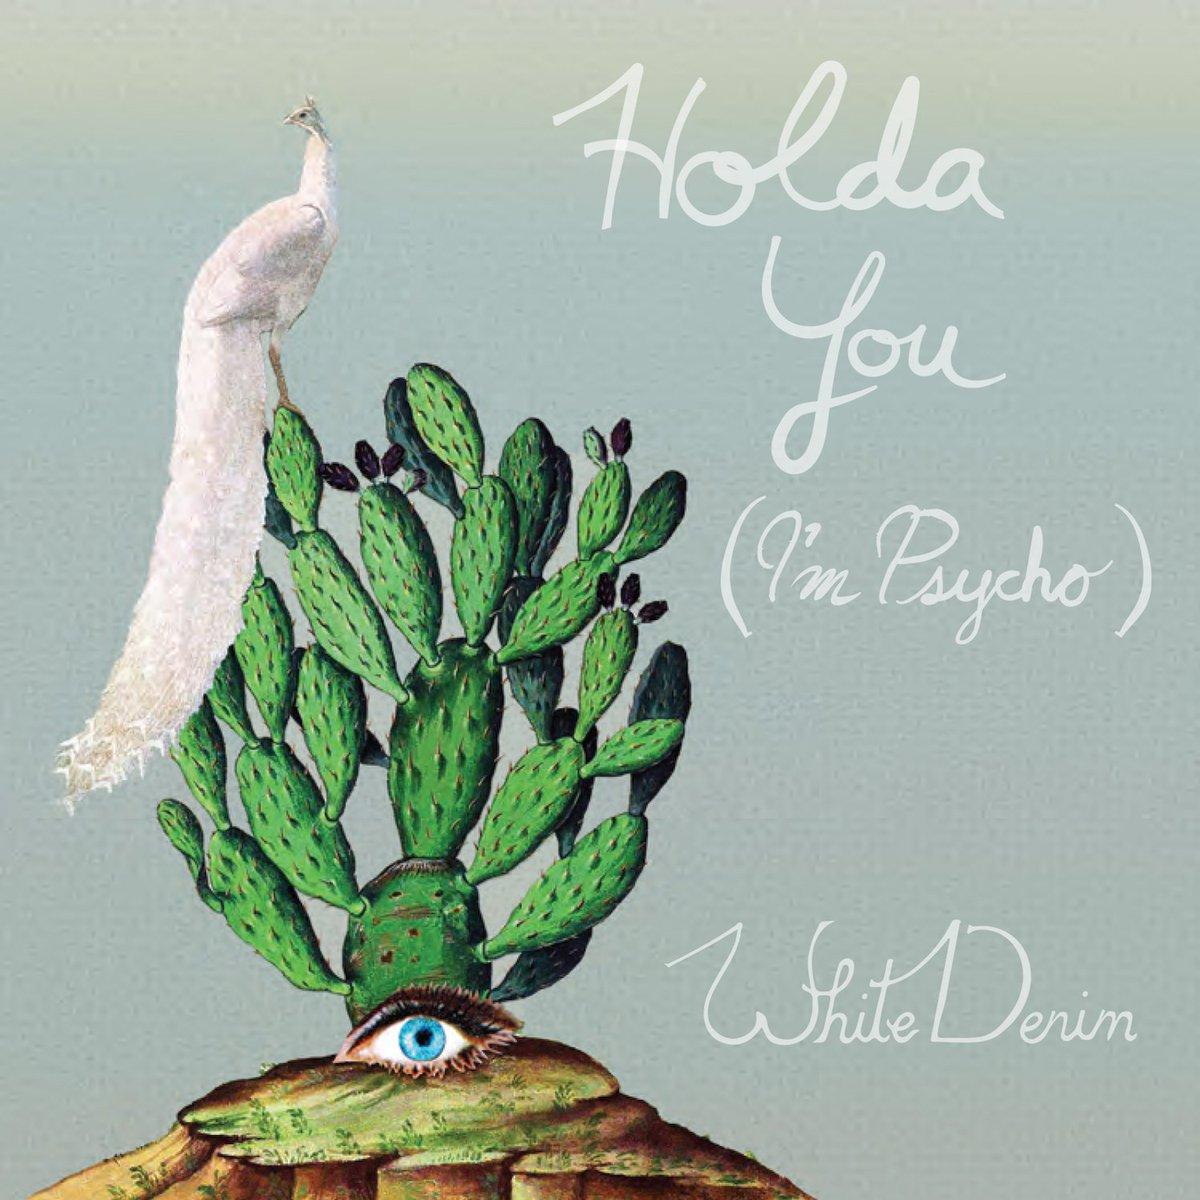 "New album 'Stiff' coming 3.25.16 Listen to first track, ""Holda You (I'm Psycho)"" on @NPR: https://t.co/kKHvRVRqwg https://t.co/Ks4f2YMdpS"